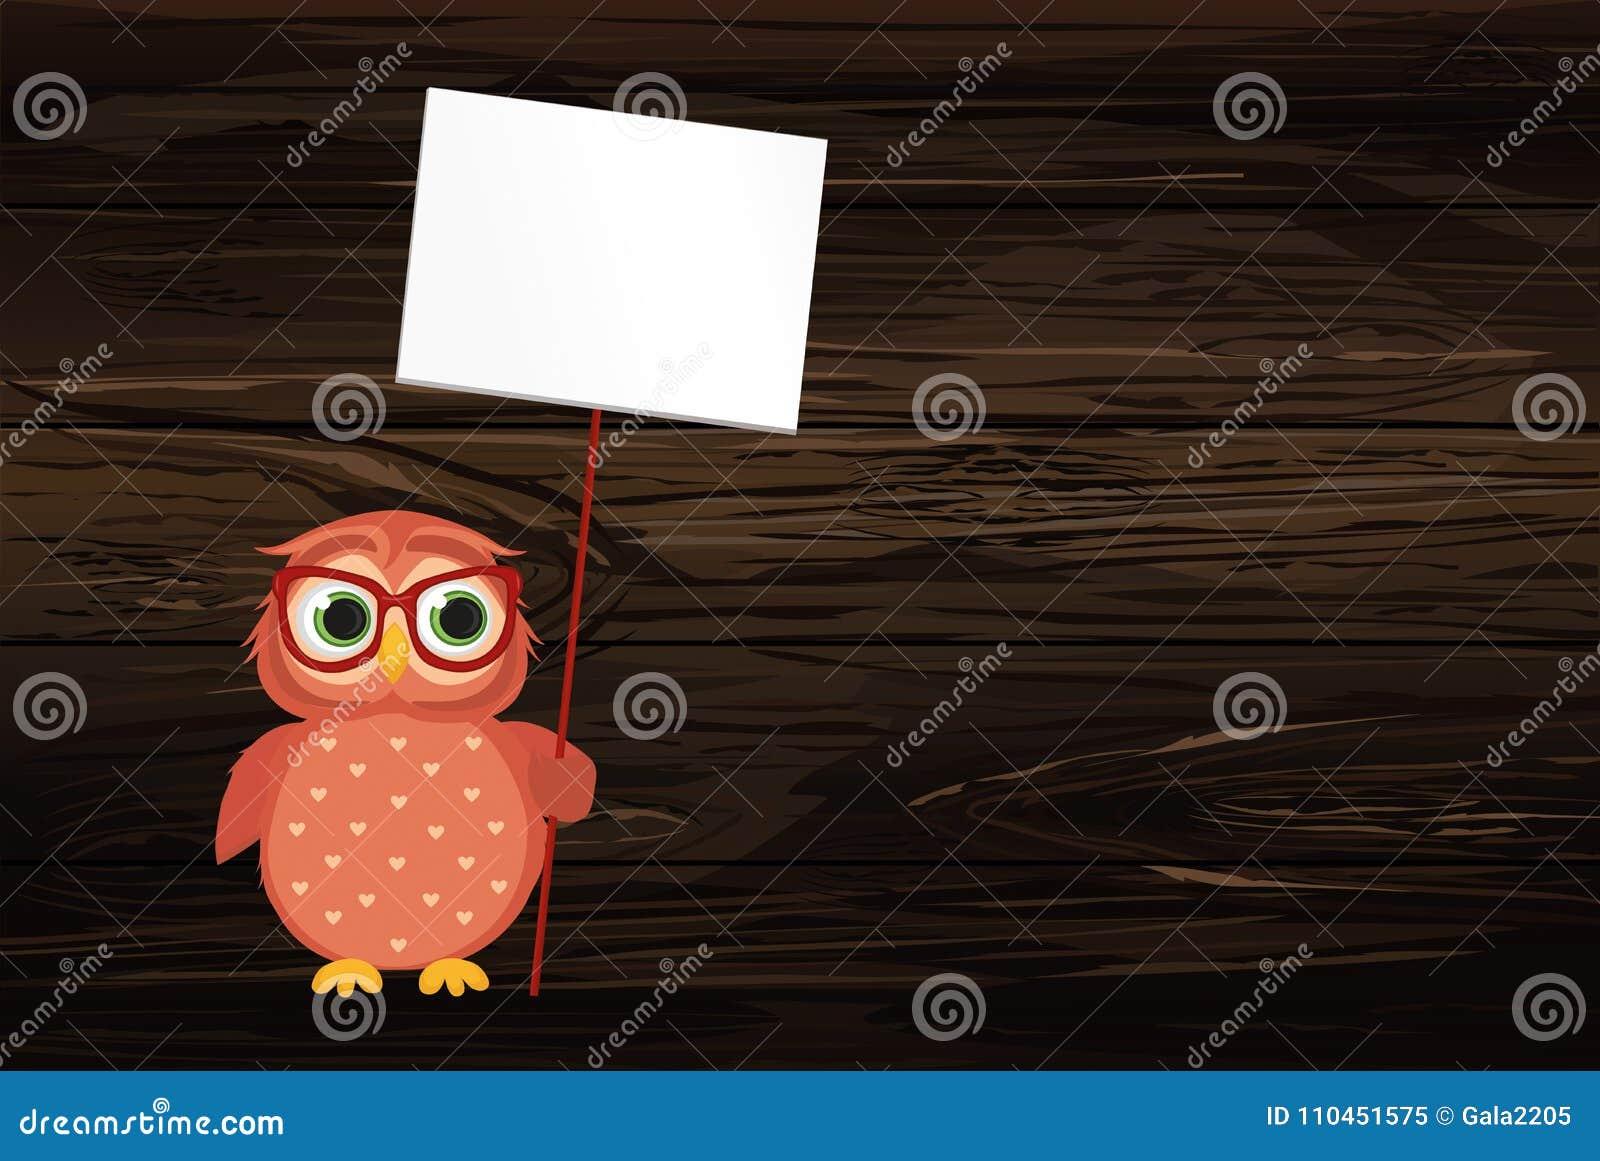 Gullig kulör uggleunge som rymmer en tom affisch Blenk för din text eller